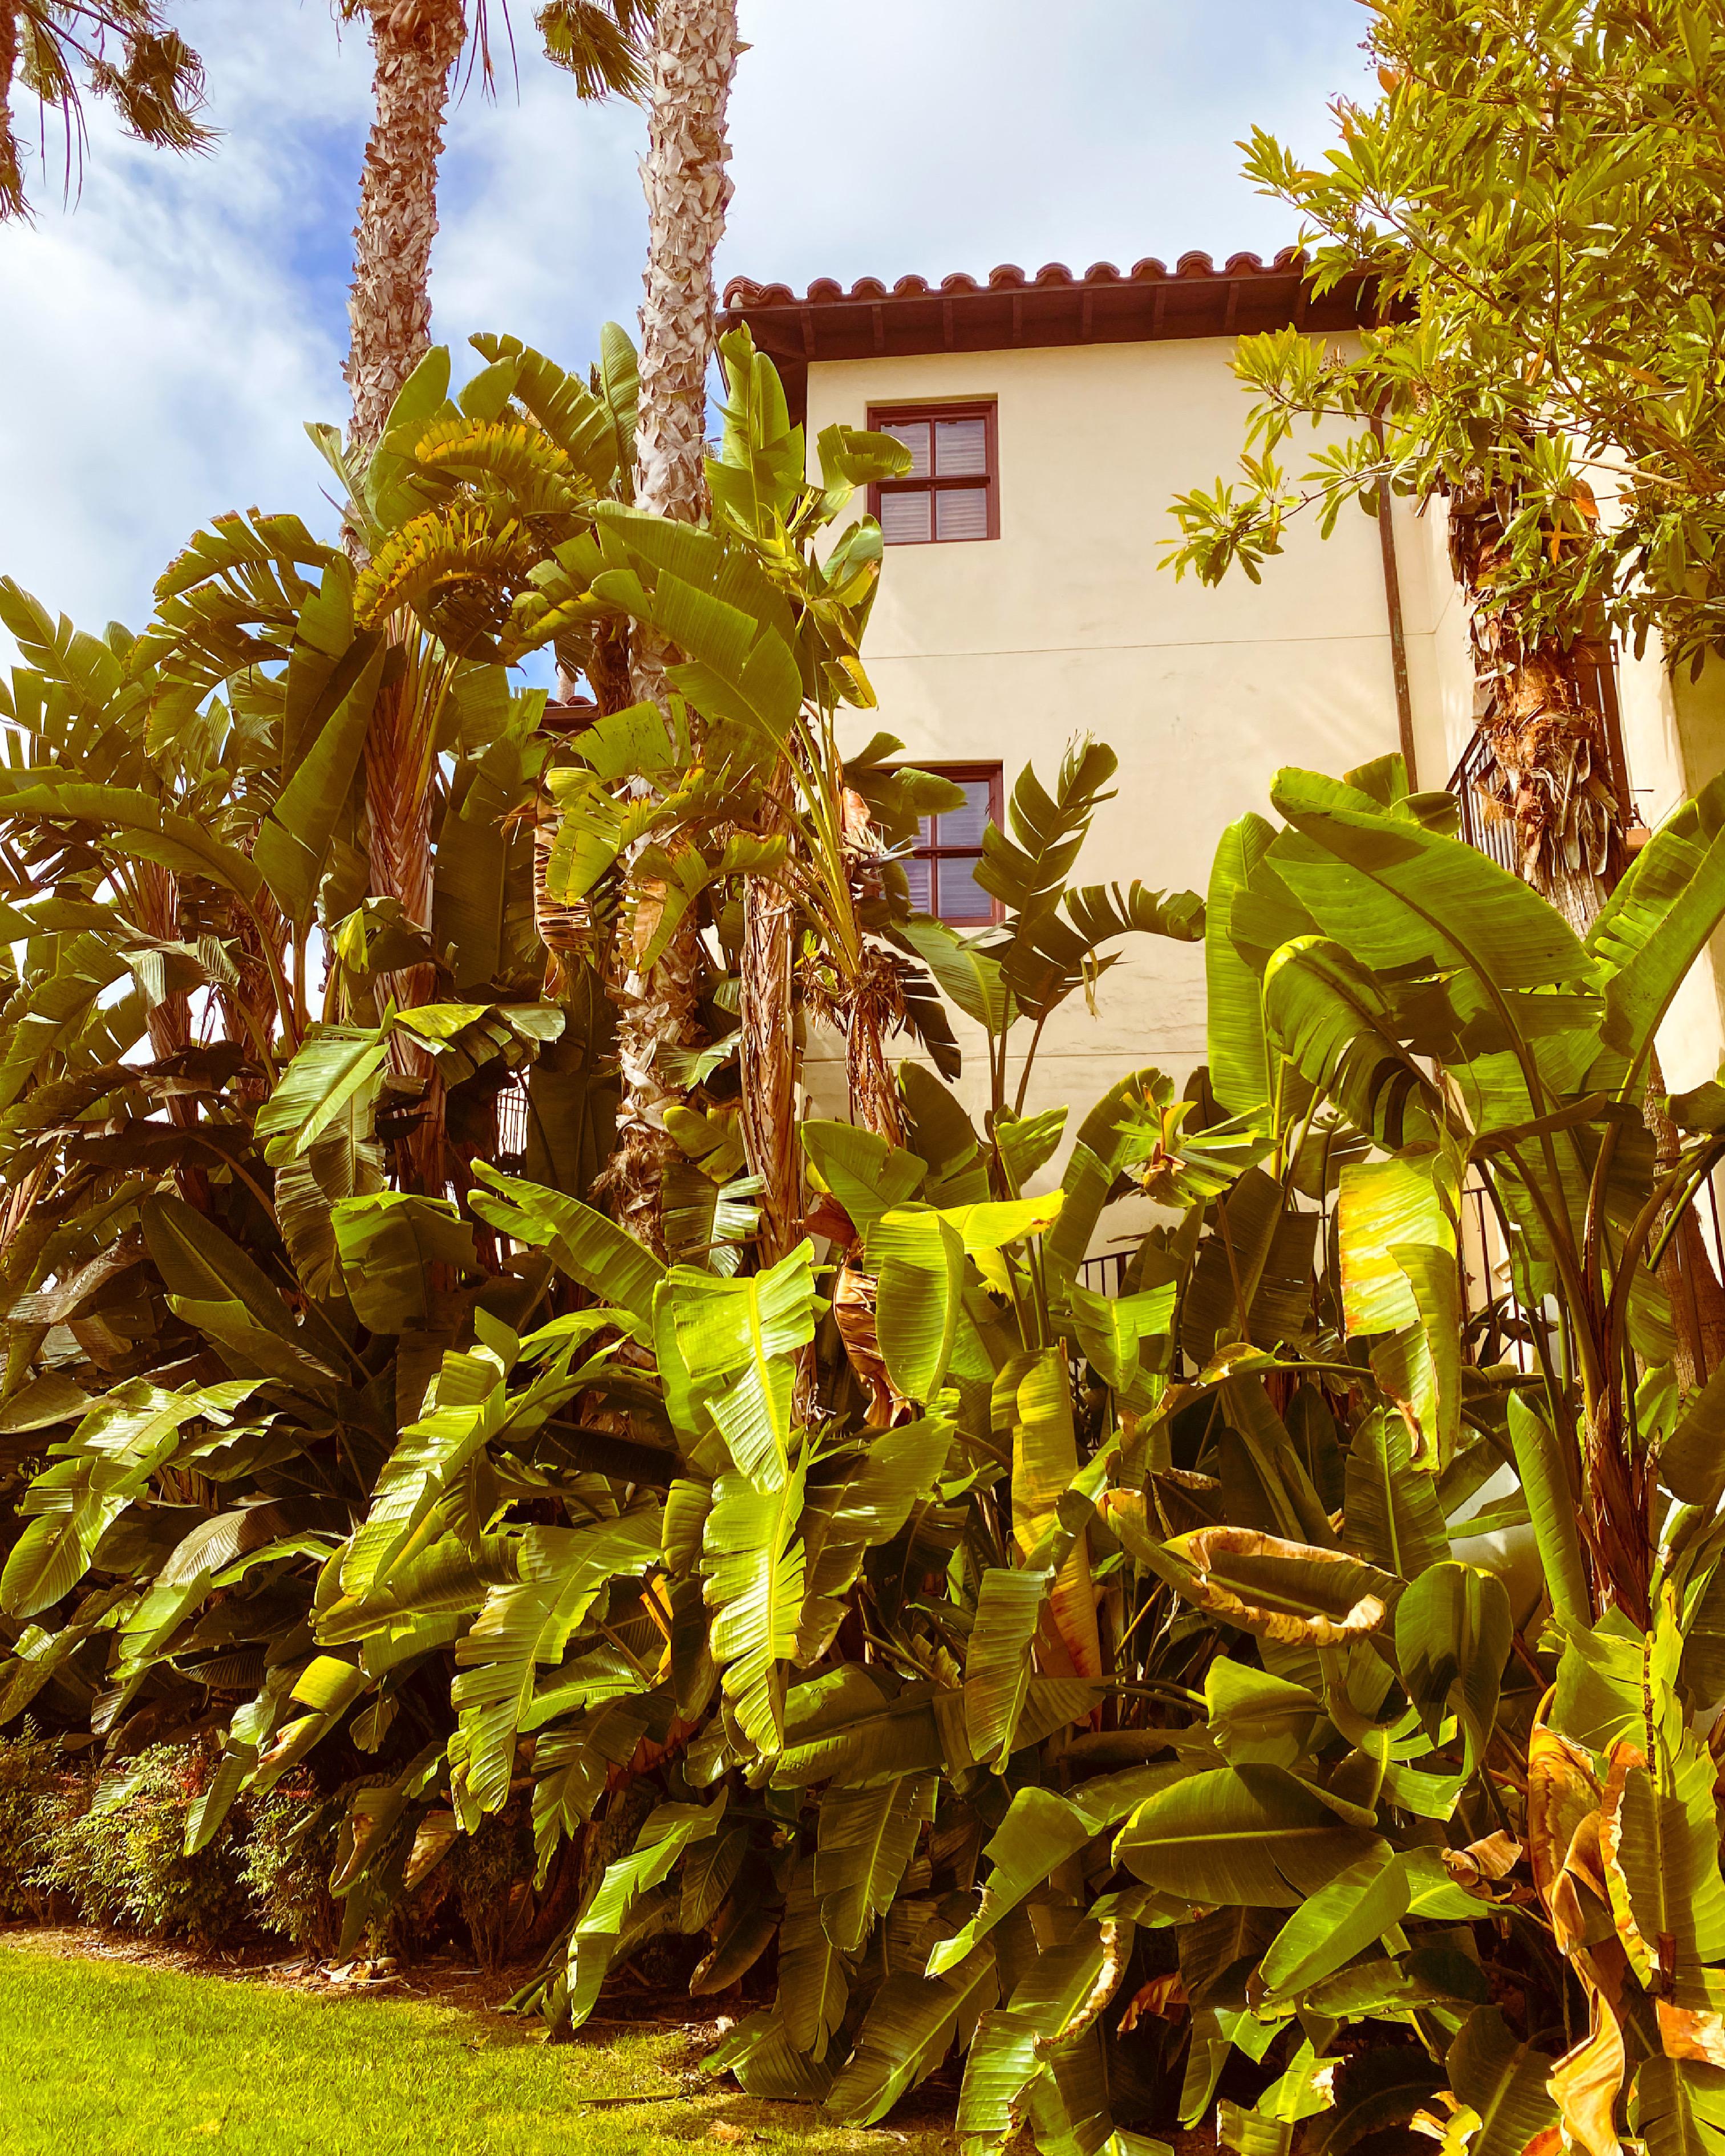 ritz baccarat Santa Barbara palms